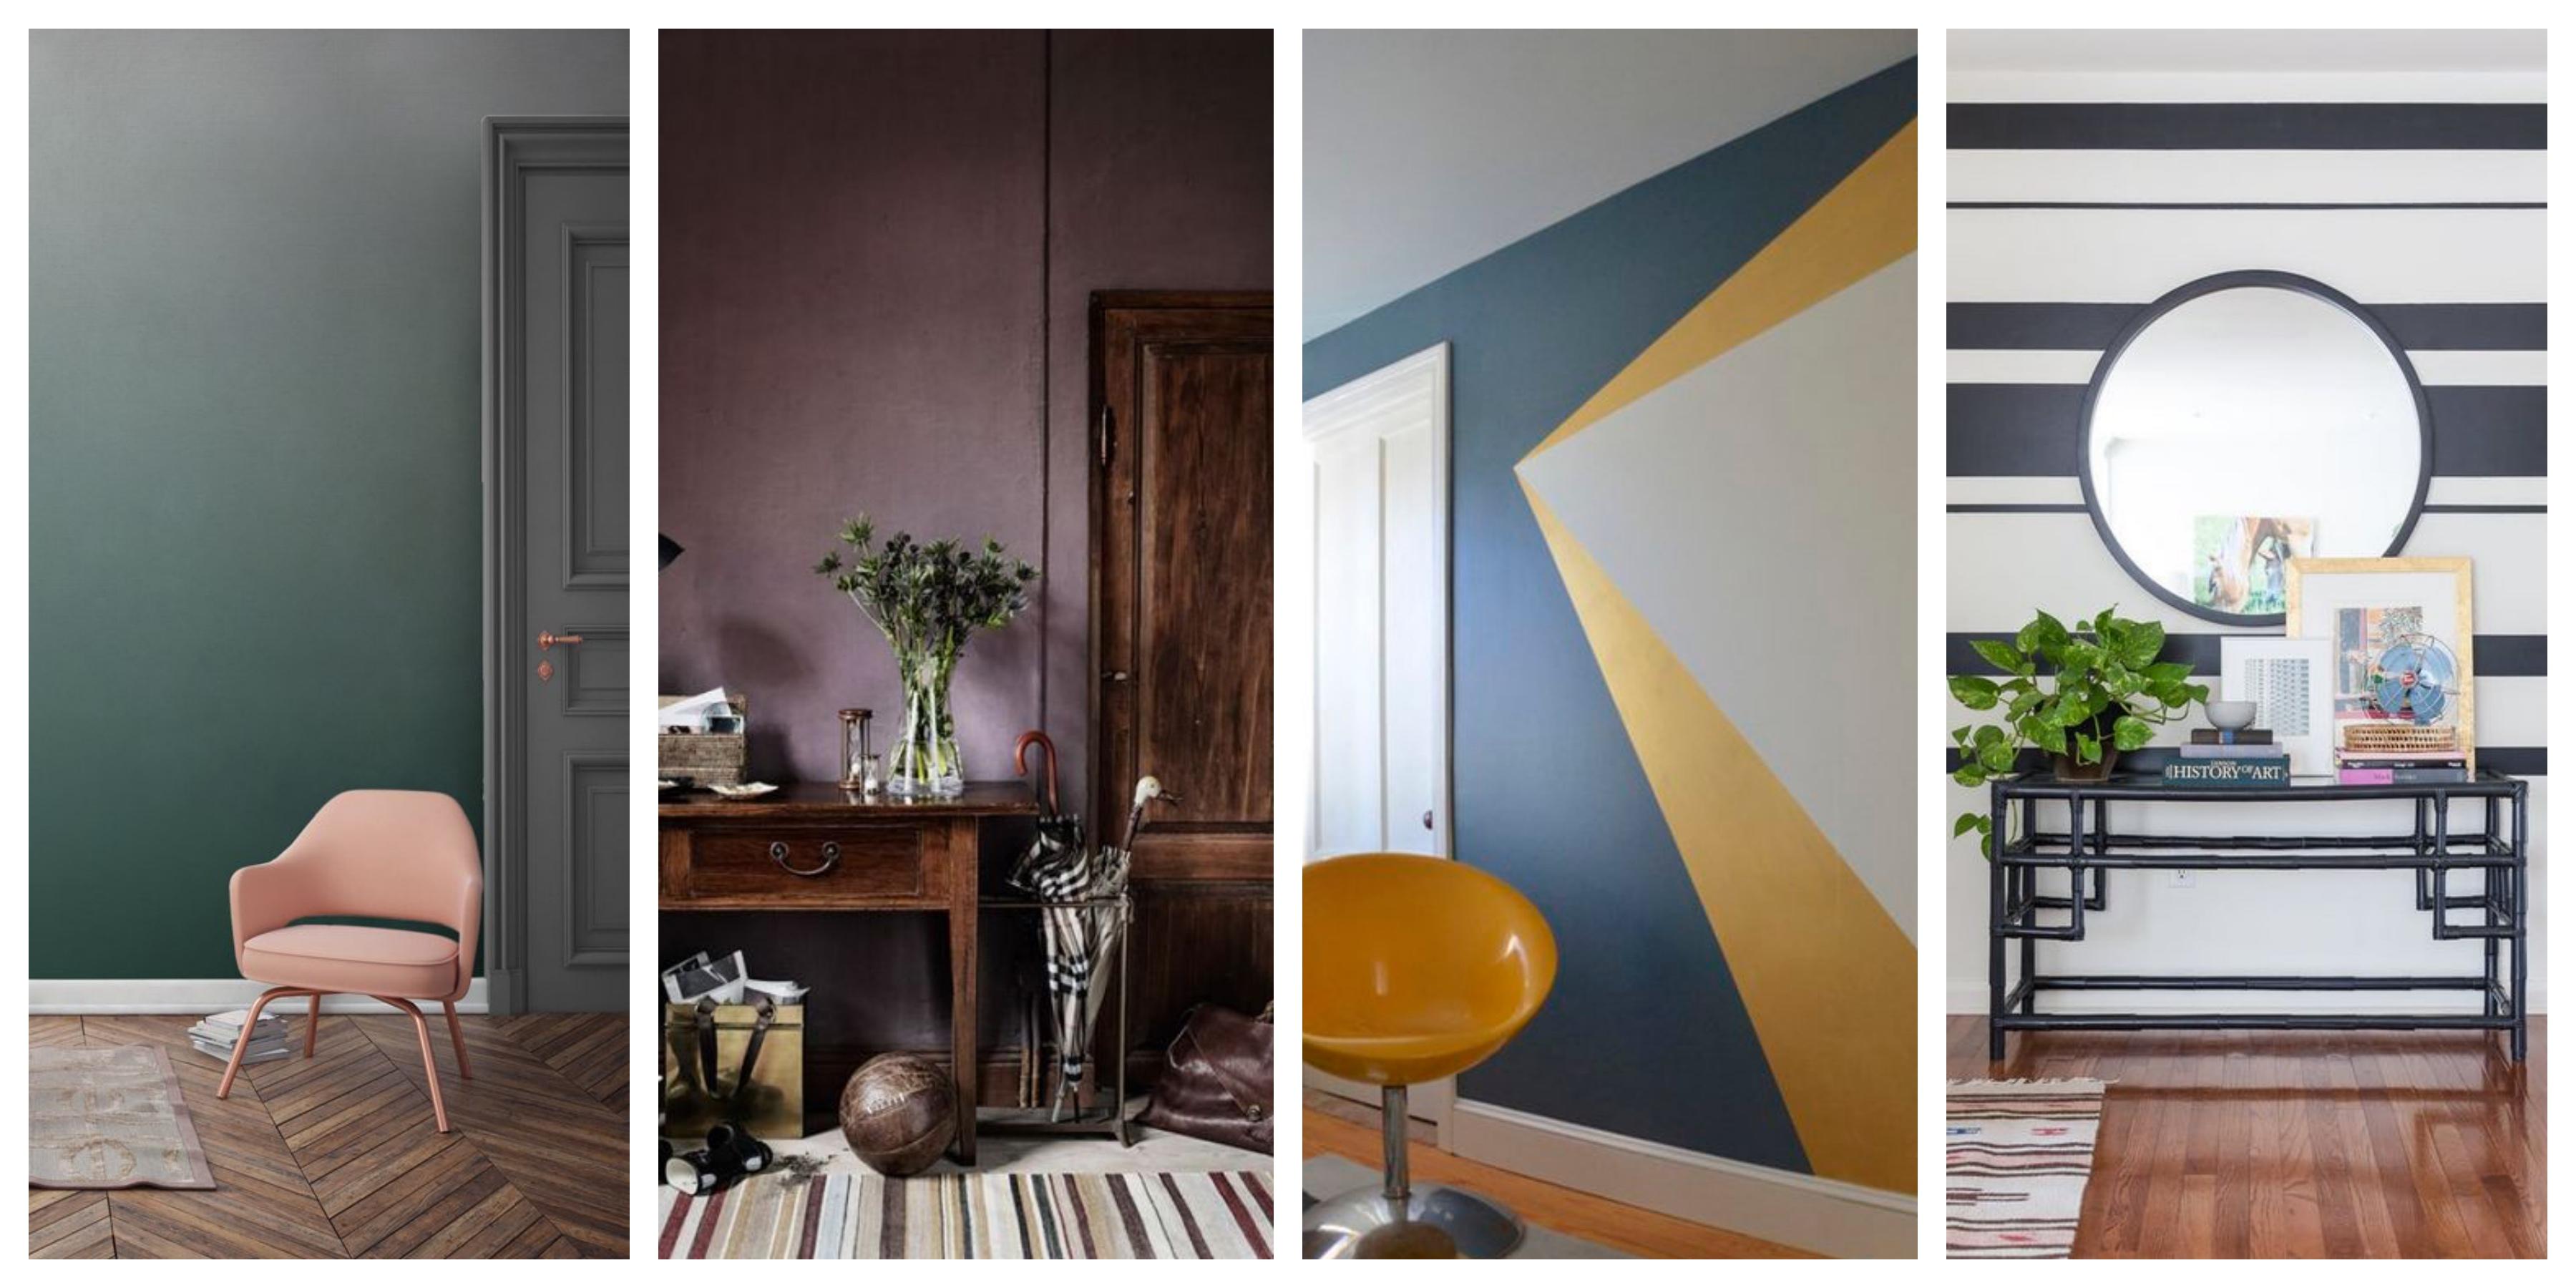 Barvy na zeď inspirace, fotogalerie